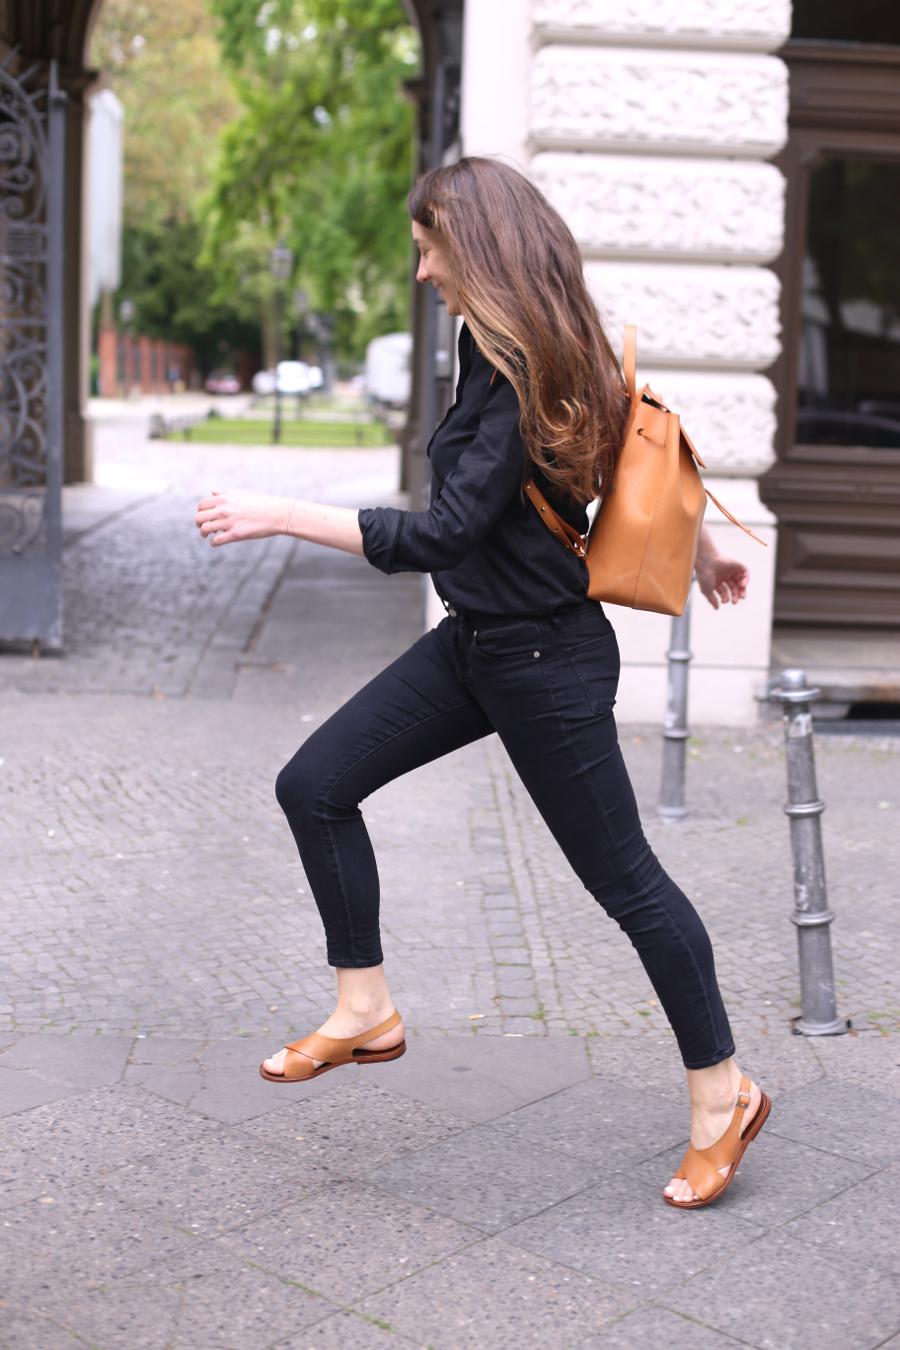 ari_traegt_toteme_linen_shirt_mansur_gavriel_backpack6